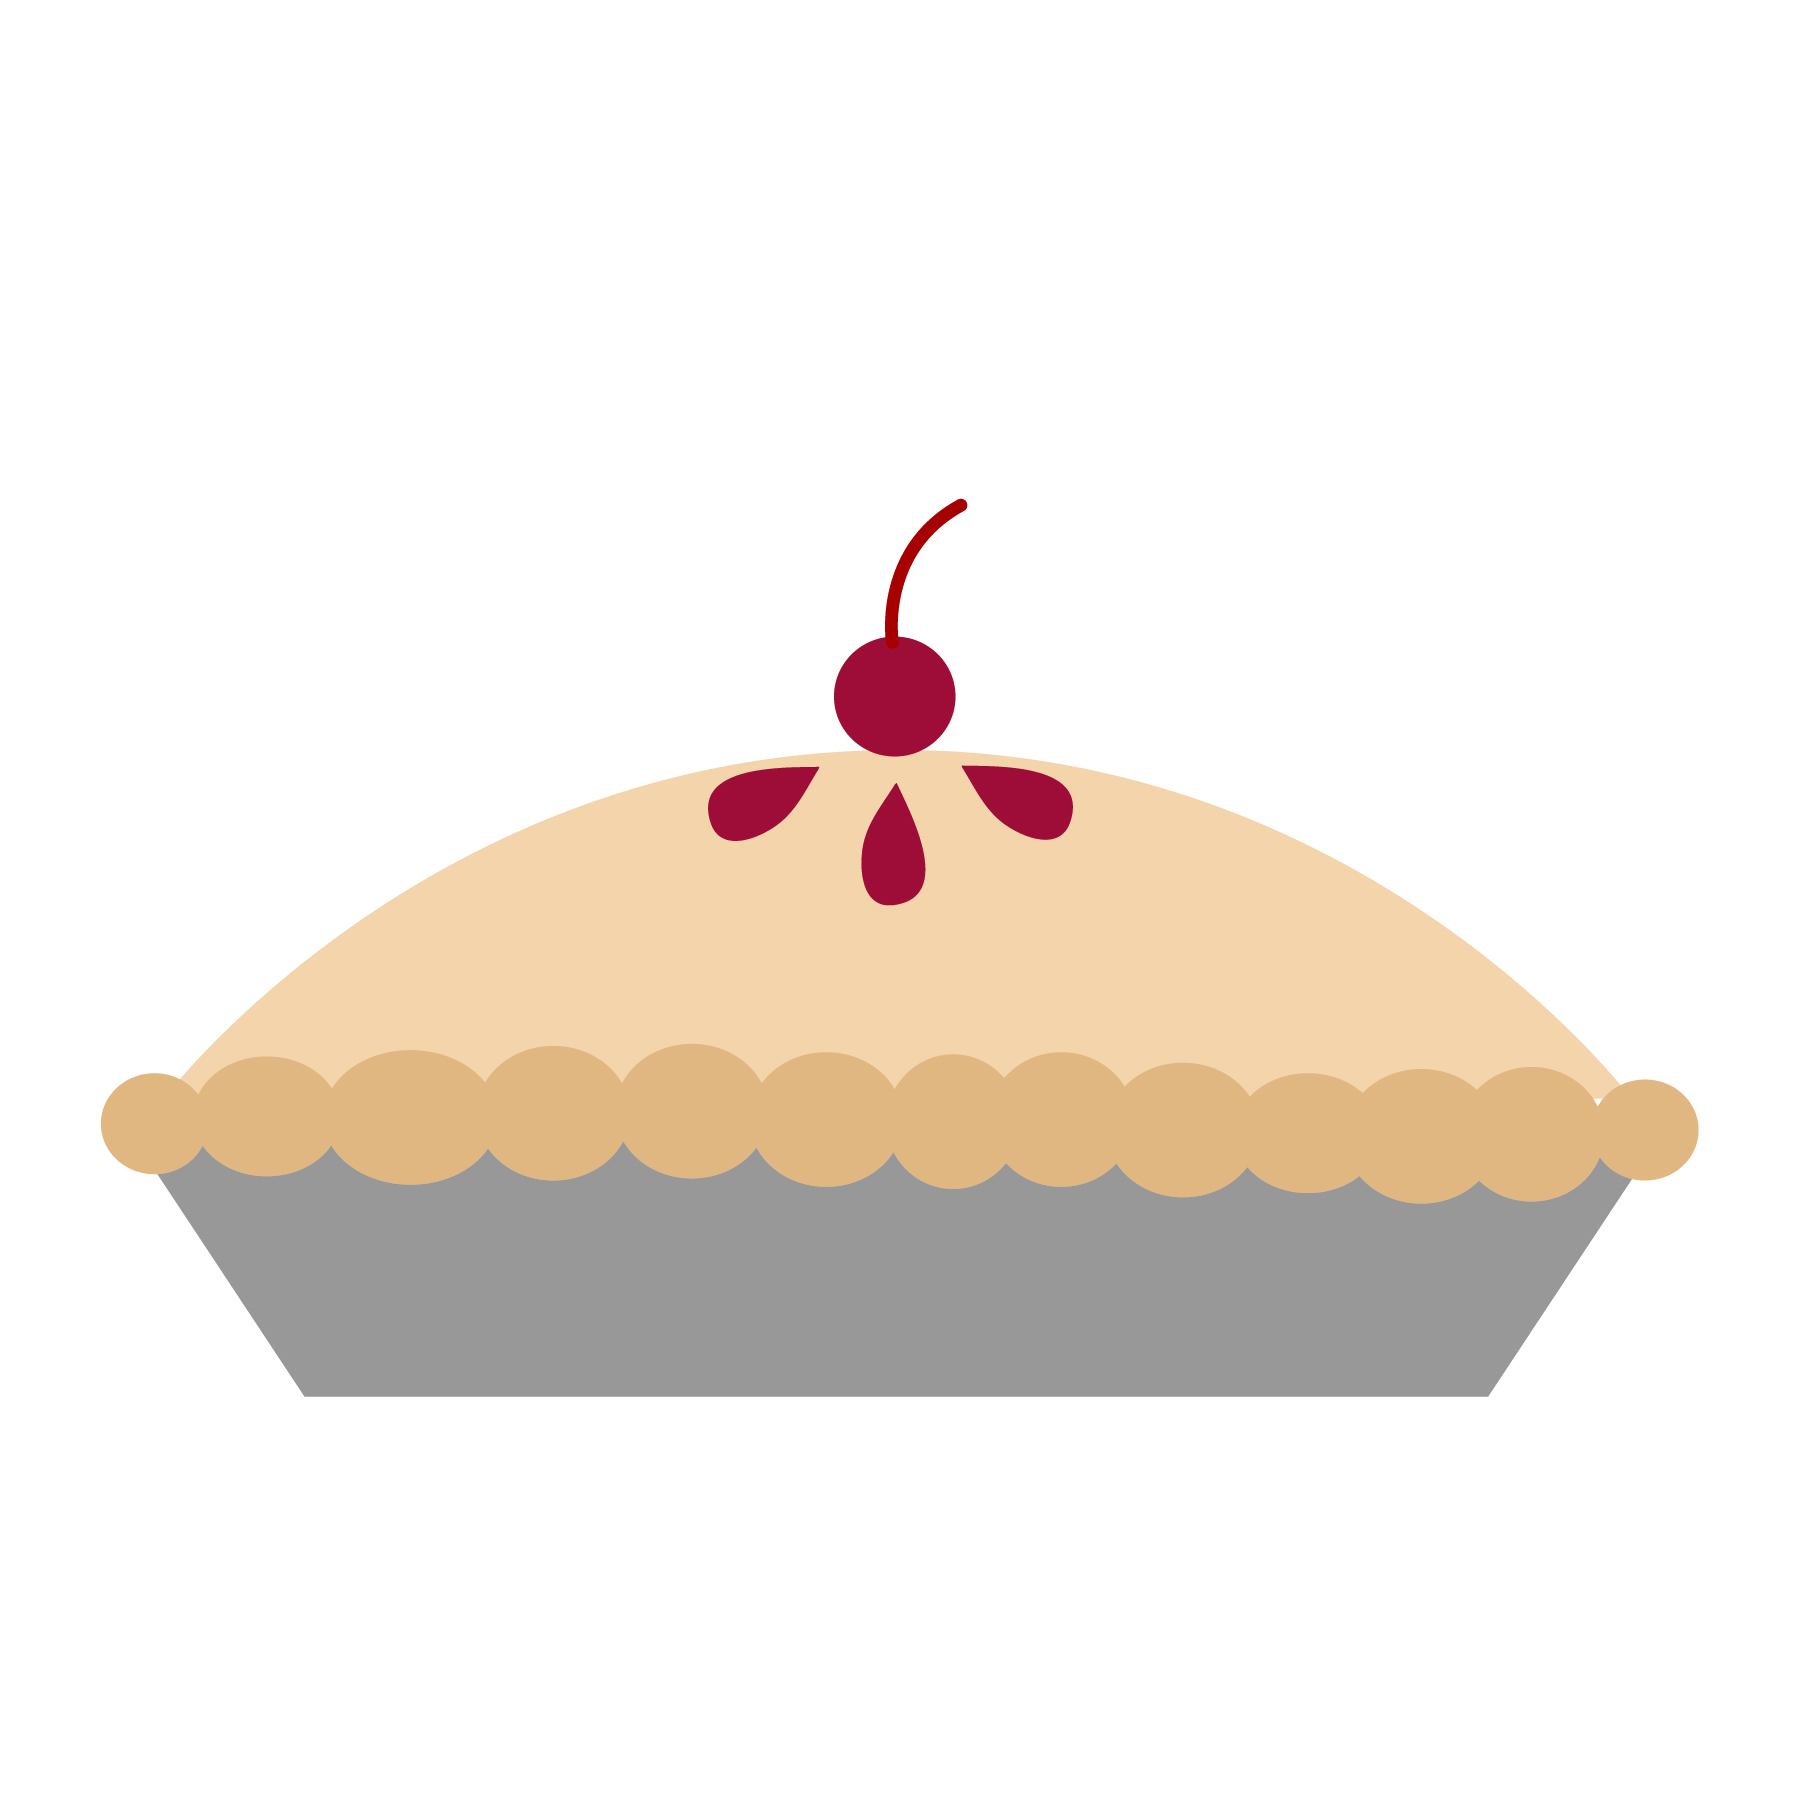 1800x1800 Baking Clipart Bake Sale